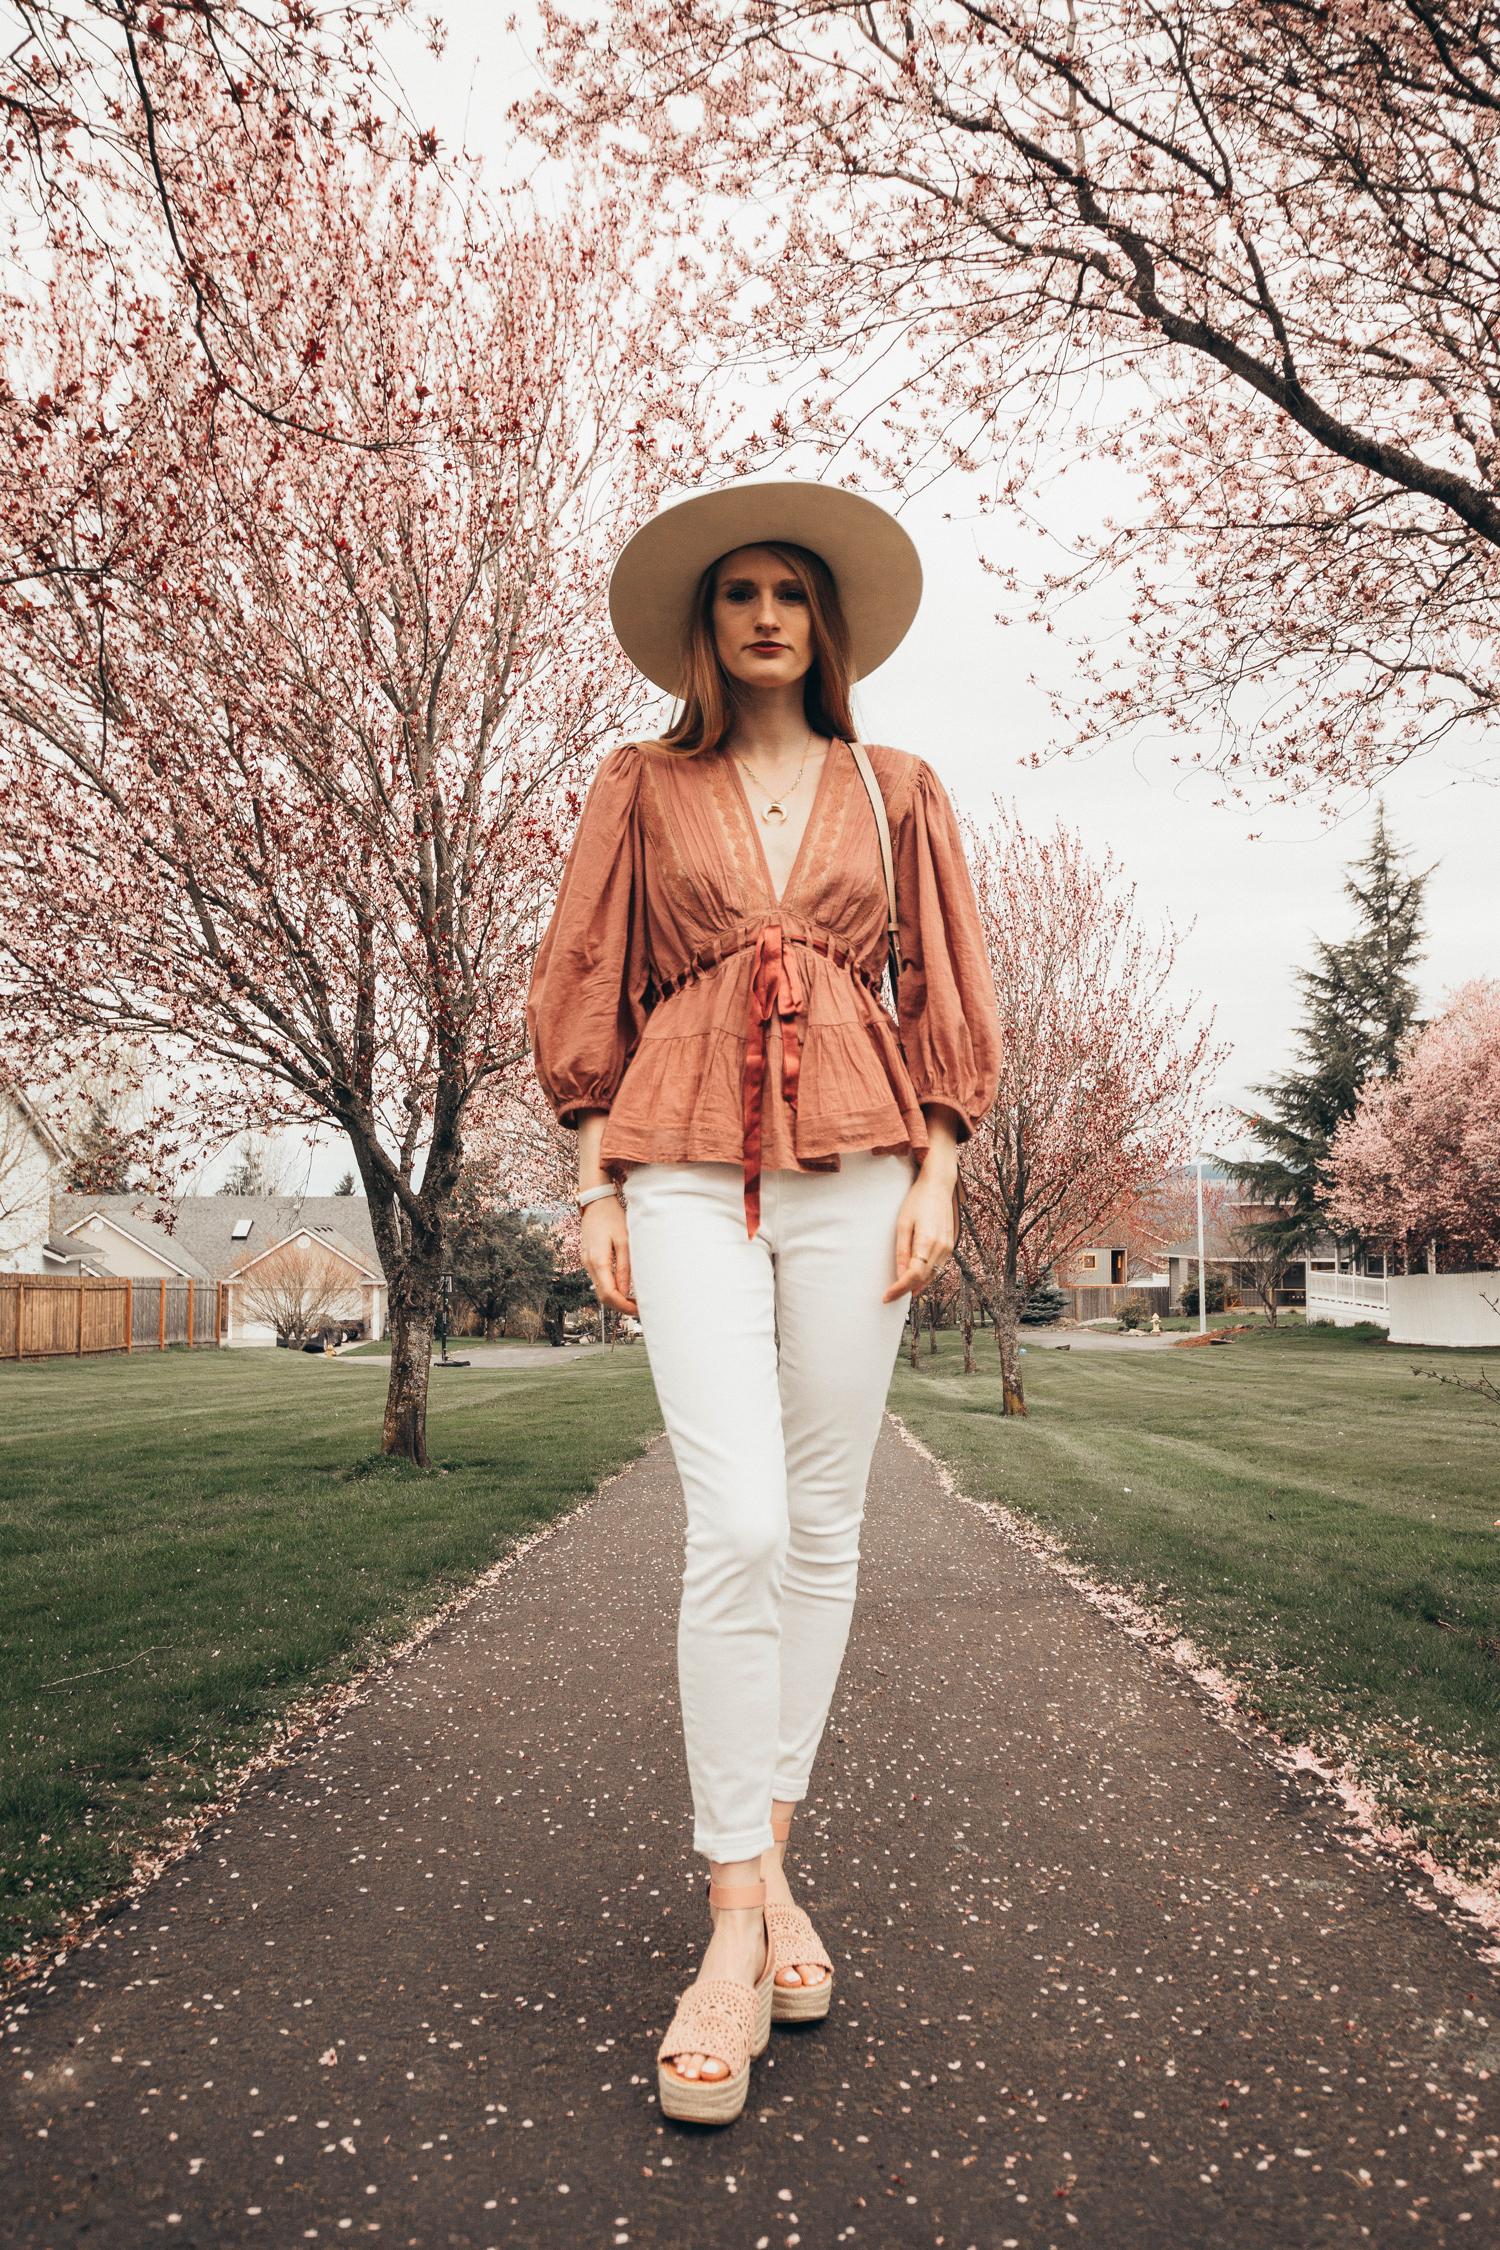 Free People Tunic Blouse Cherry Blossoms Favorite Romance